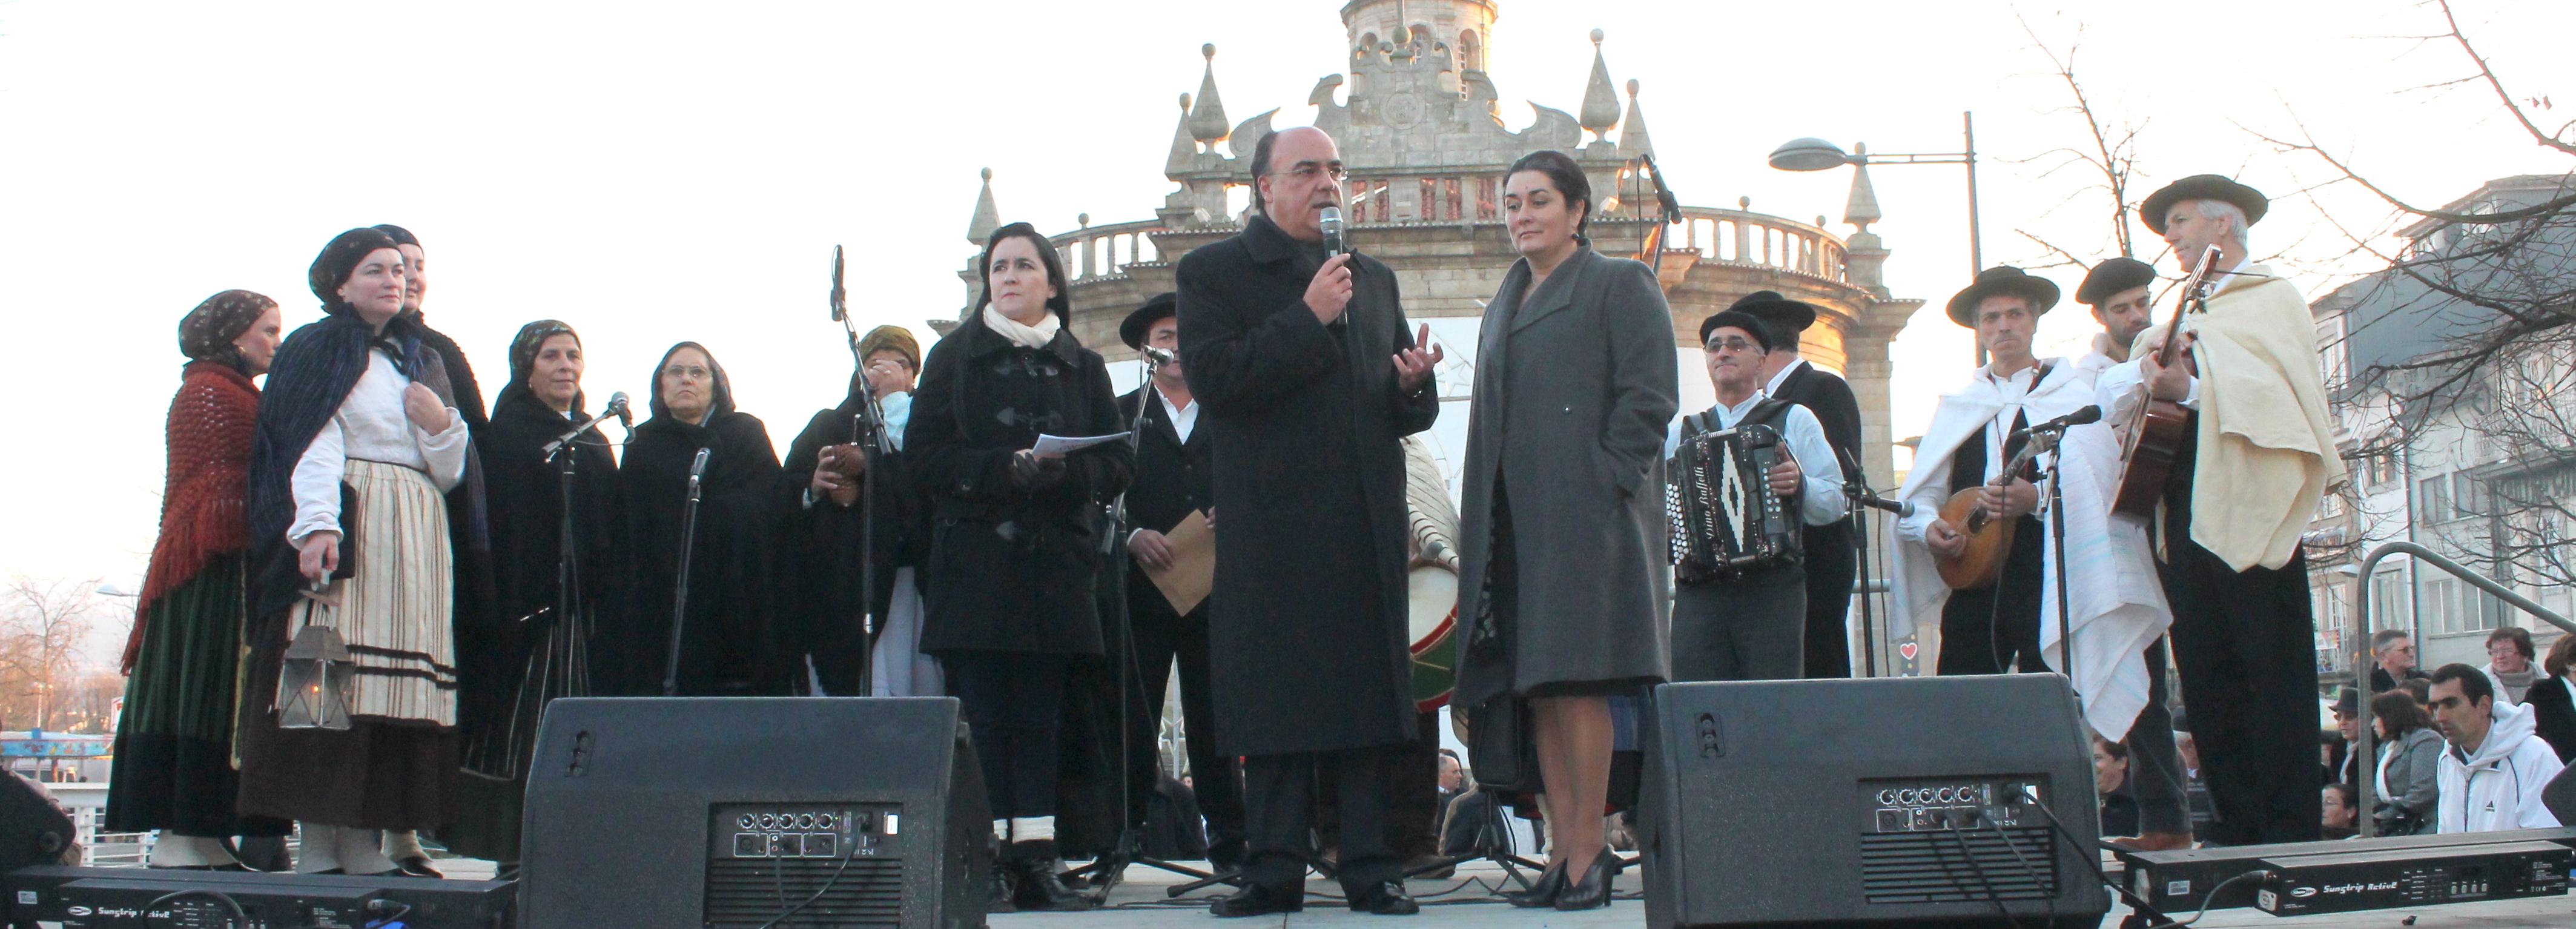 Cantares dos Reis juntou milhares na Avenida da Liberdade